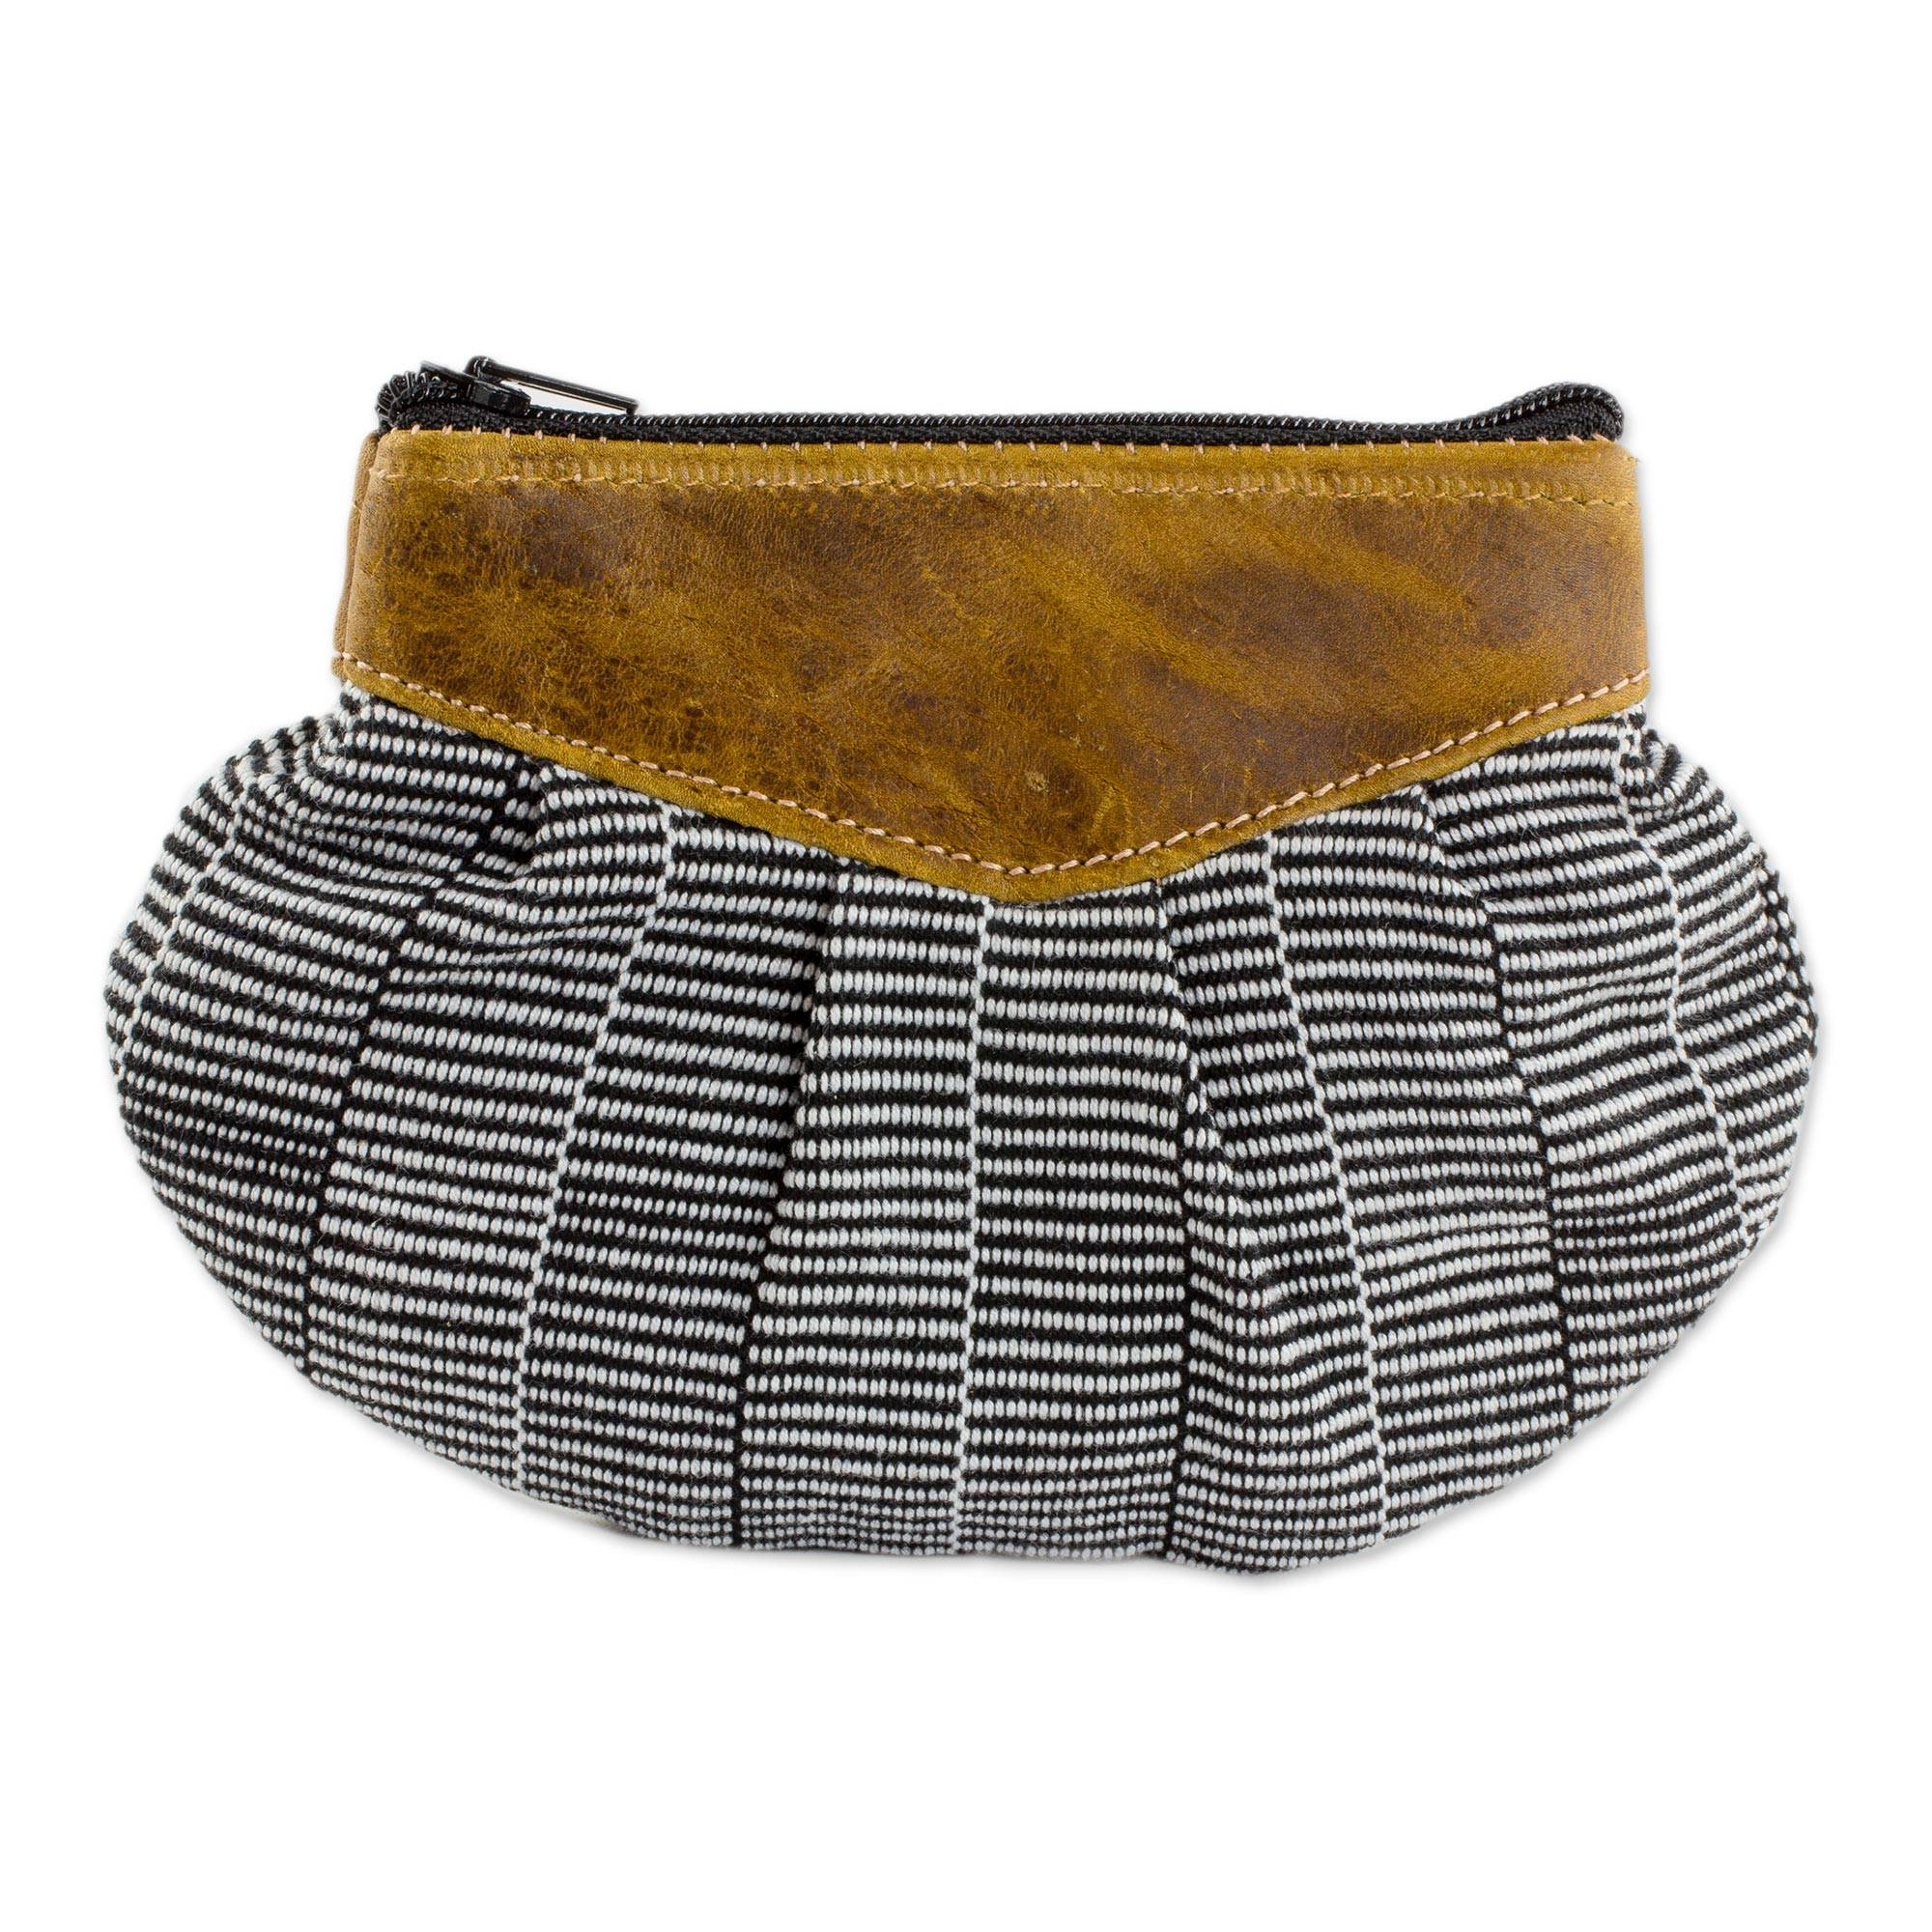 Novica Leather-accented cotton clutch handbag, Modern Mocha